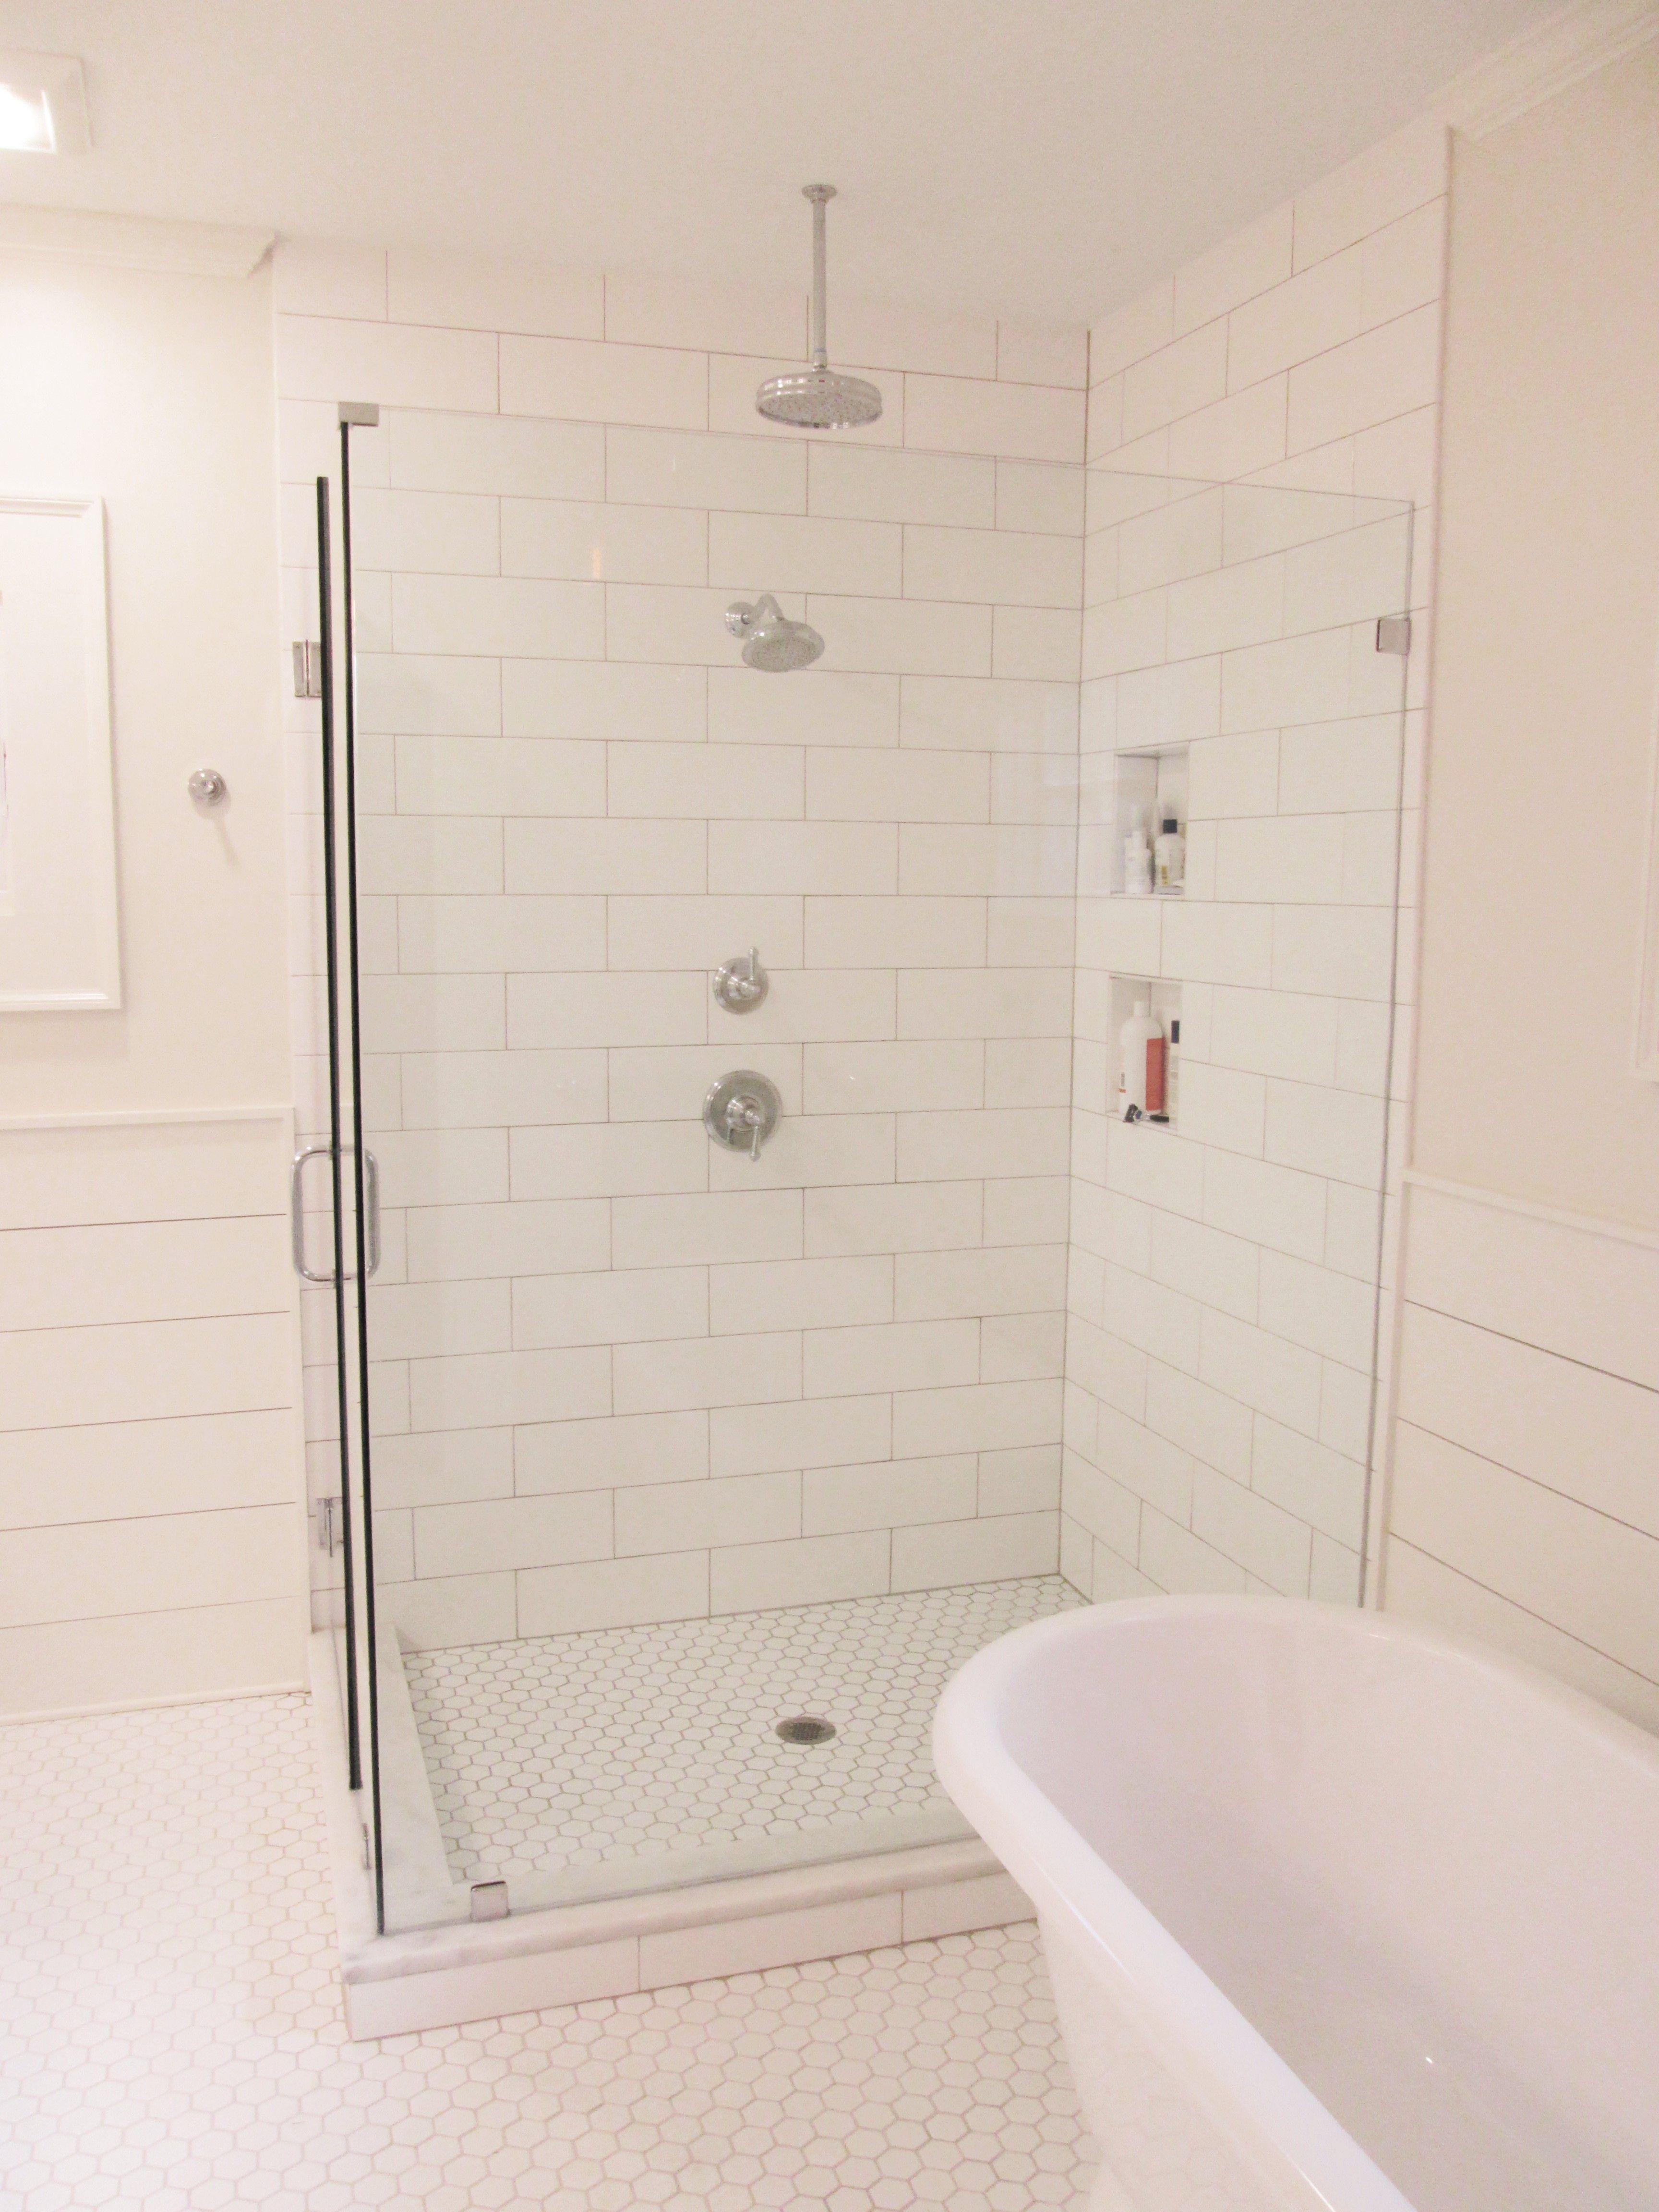 Frameless Shower Enclosure As Part Of Master Bathroom Renovation By Penn  Carpentry, Atlanta General Contractor